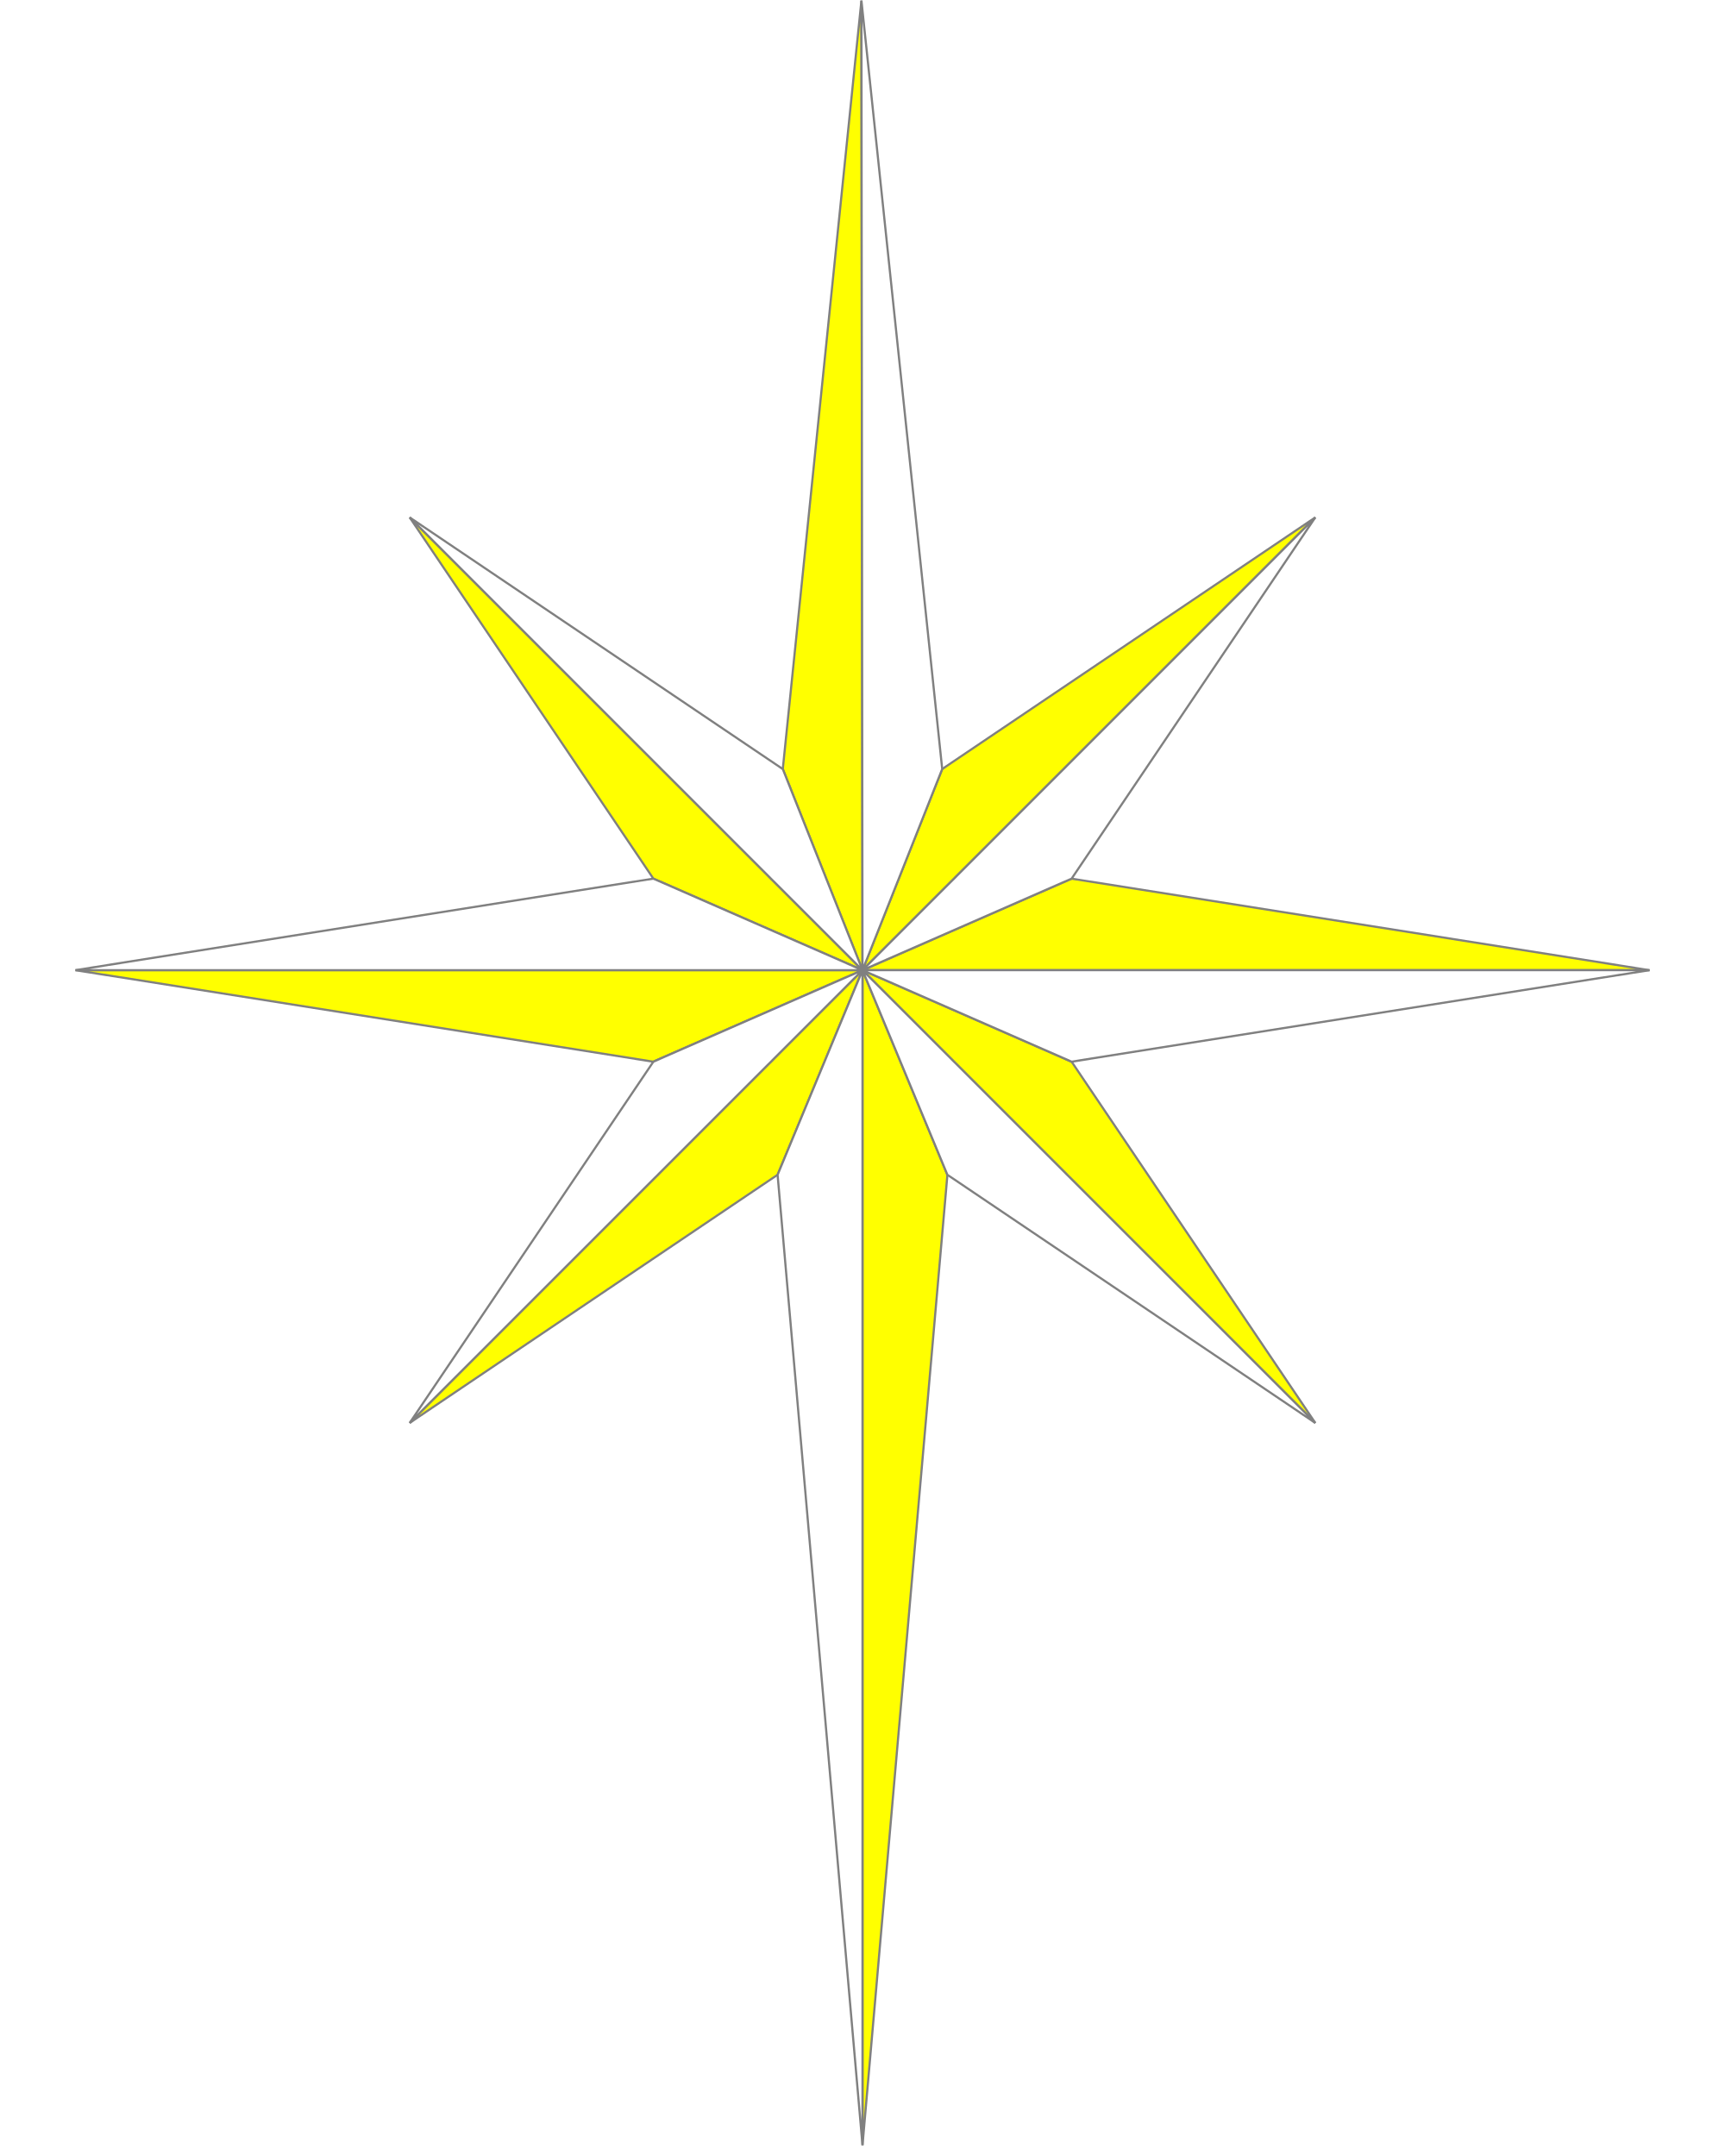 Star of bethlehem clipart image royalty free download File:BethlehemStar.svg - Wikimedia Commons image royalty free download